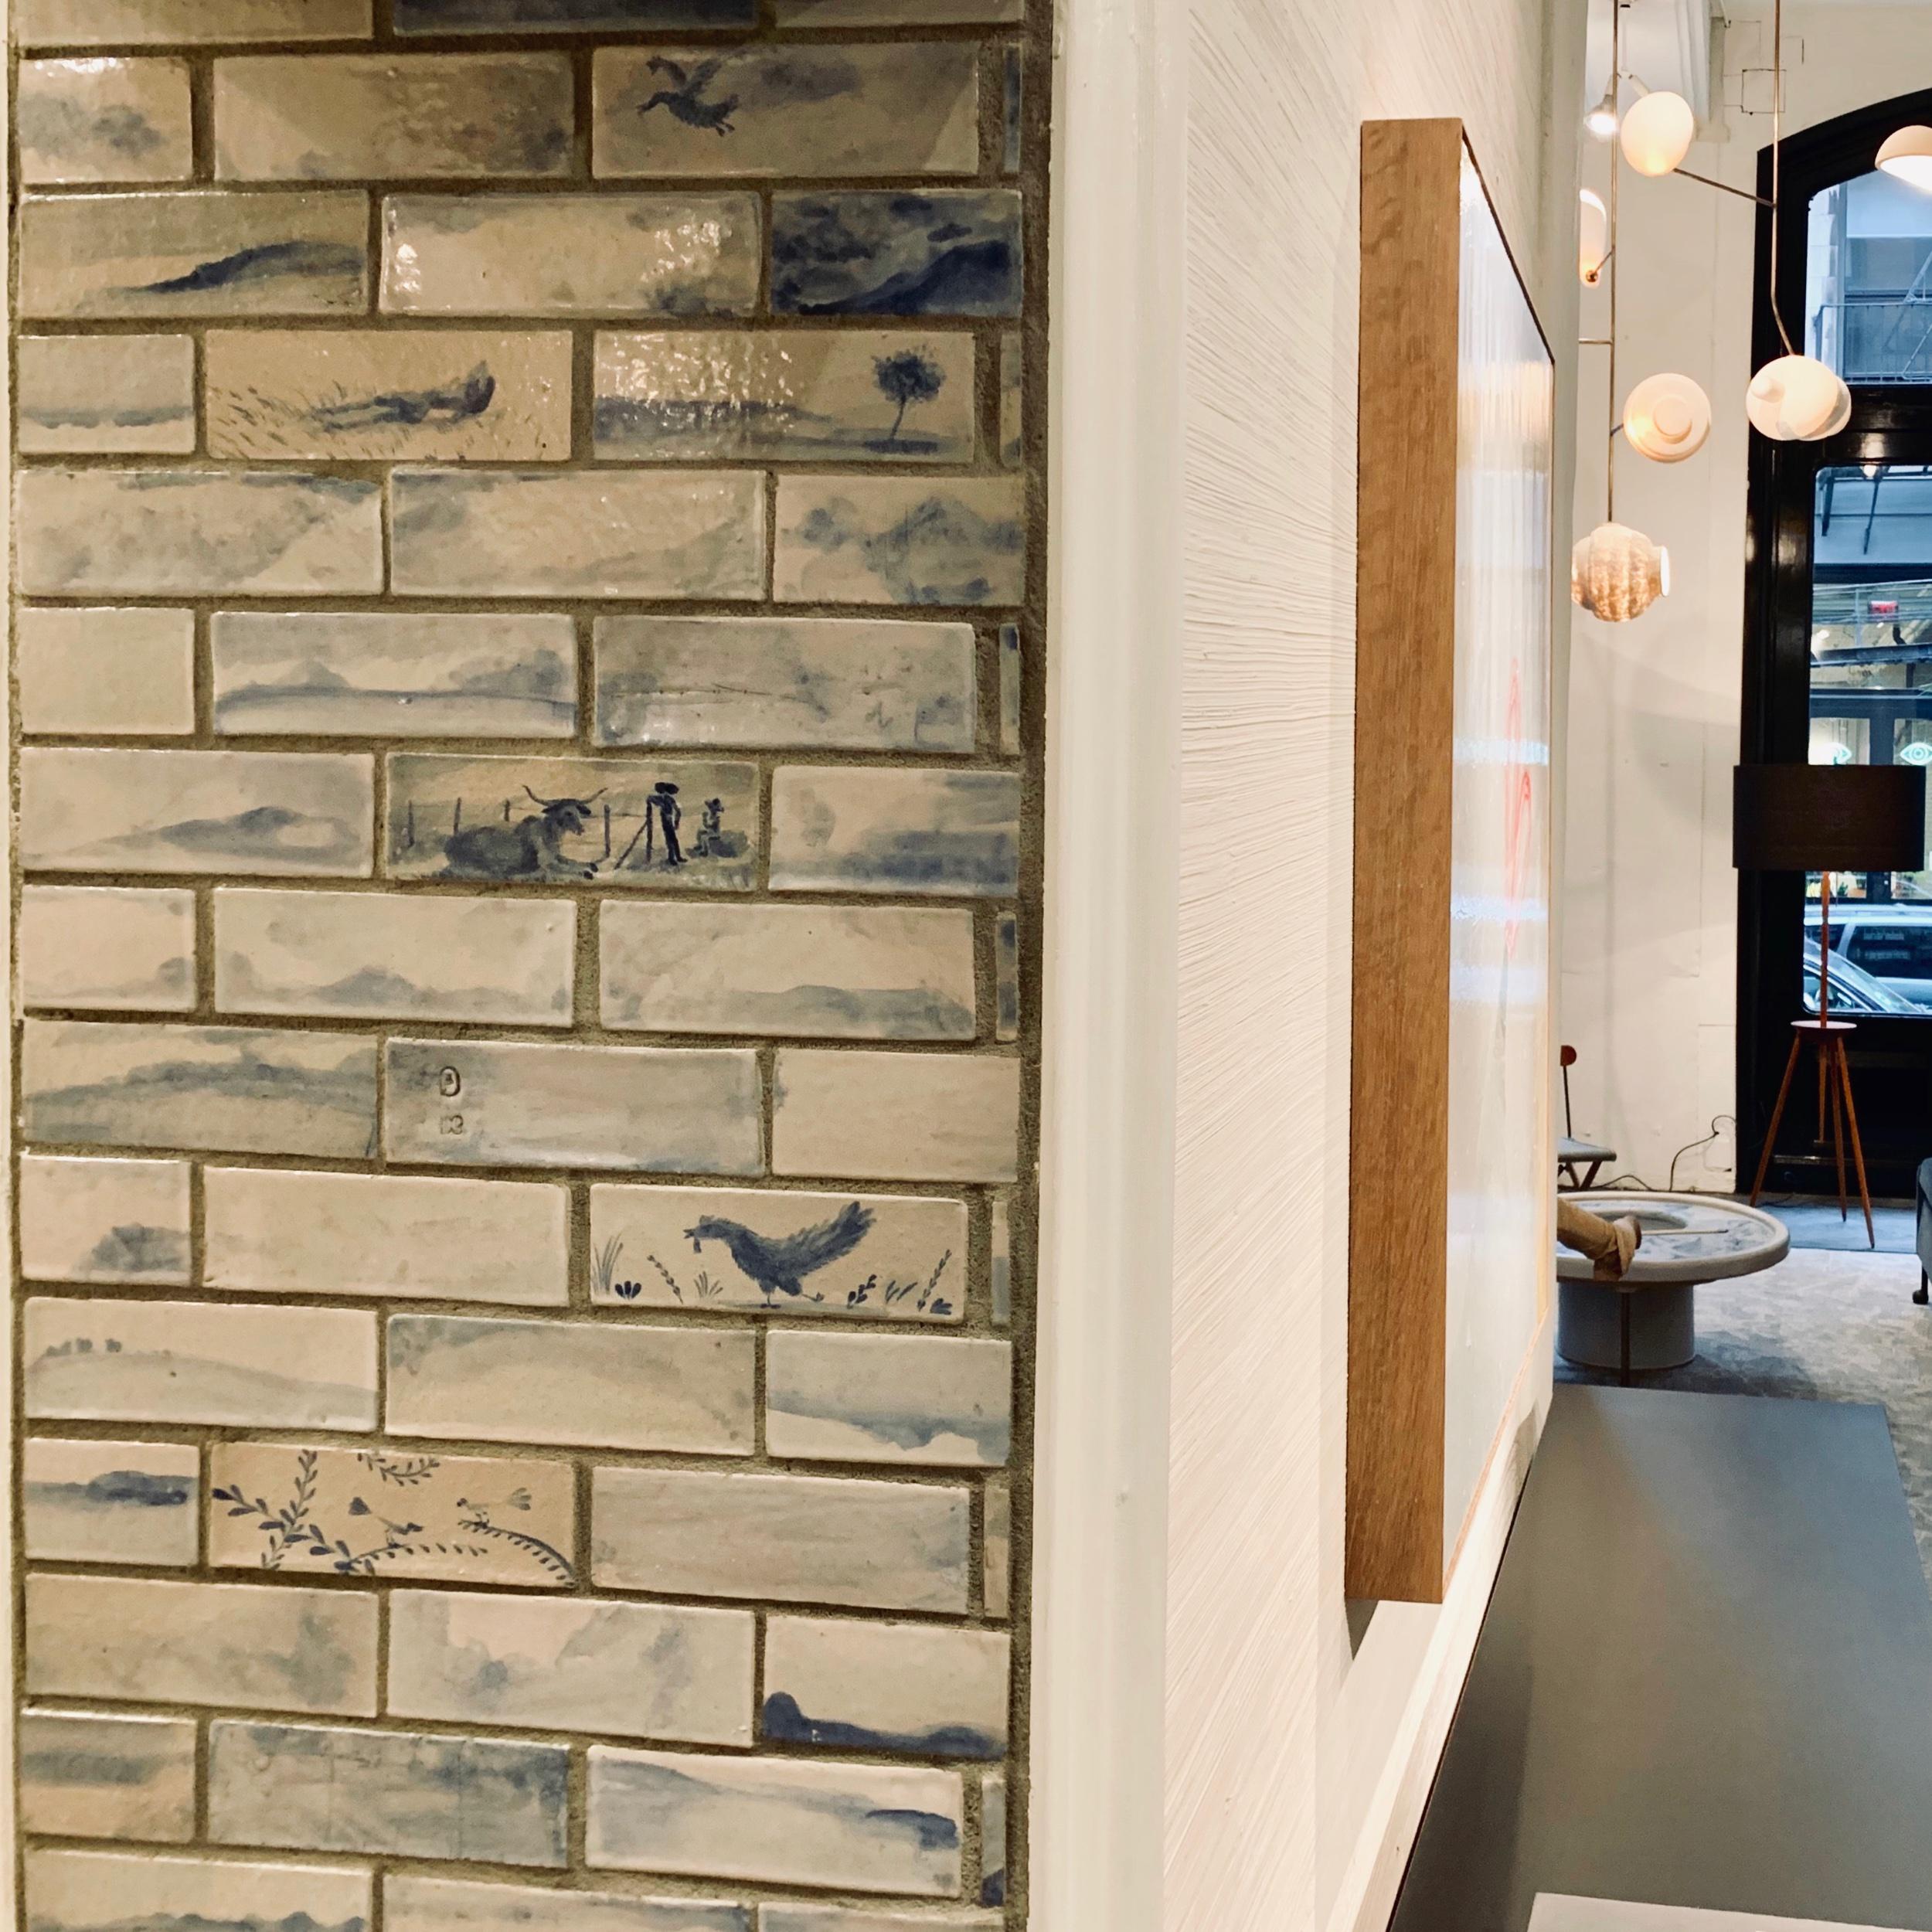 Bespoke Handpainted Wall Ceramic Wall Tiles by Tyler Hays BDDW